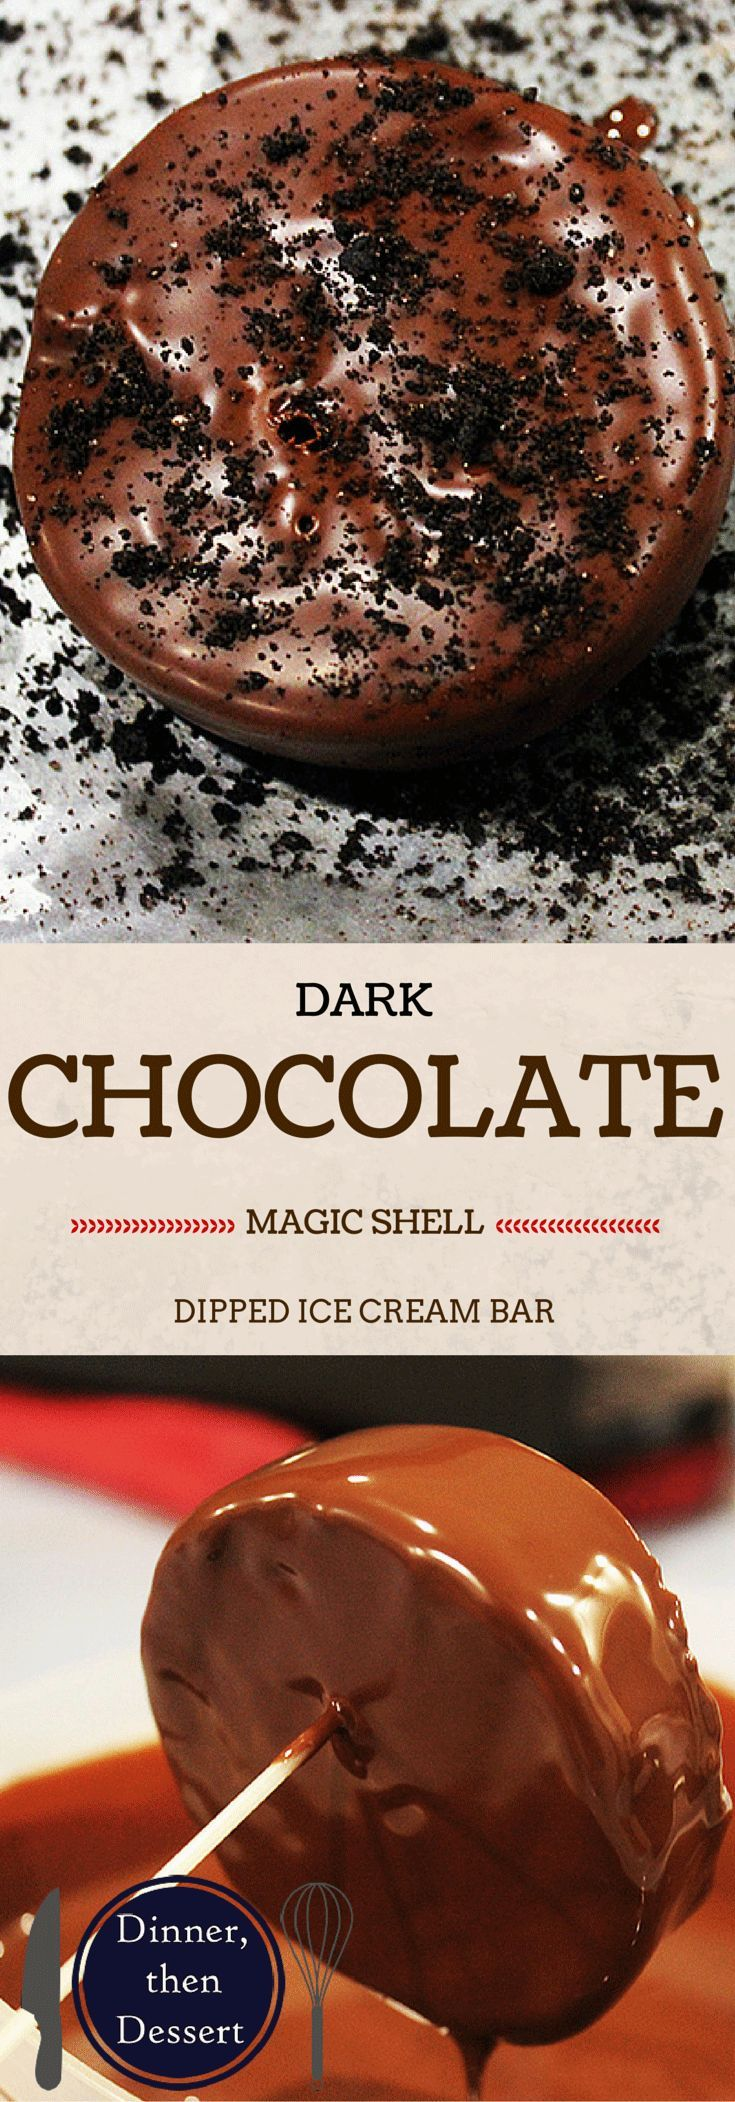 A take on the iconic Klondike Ice Cream Bar. Dark Chocolate Ice Cream dipped in Bittersweet Chocolate Magic Shell!